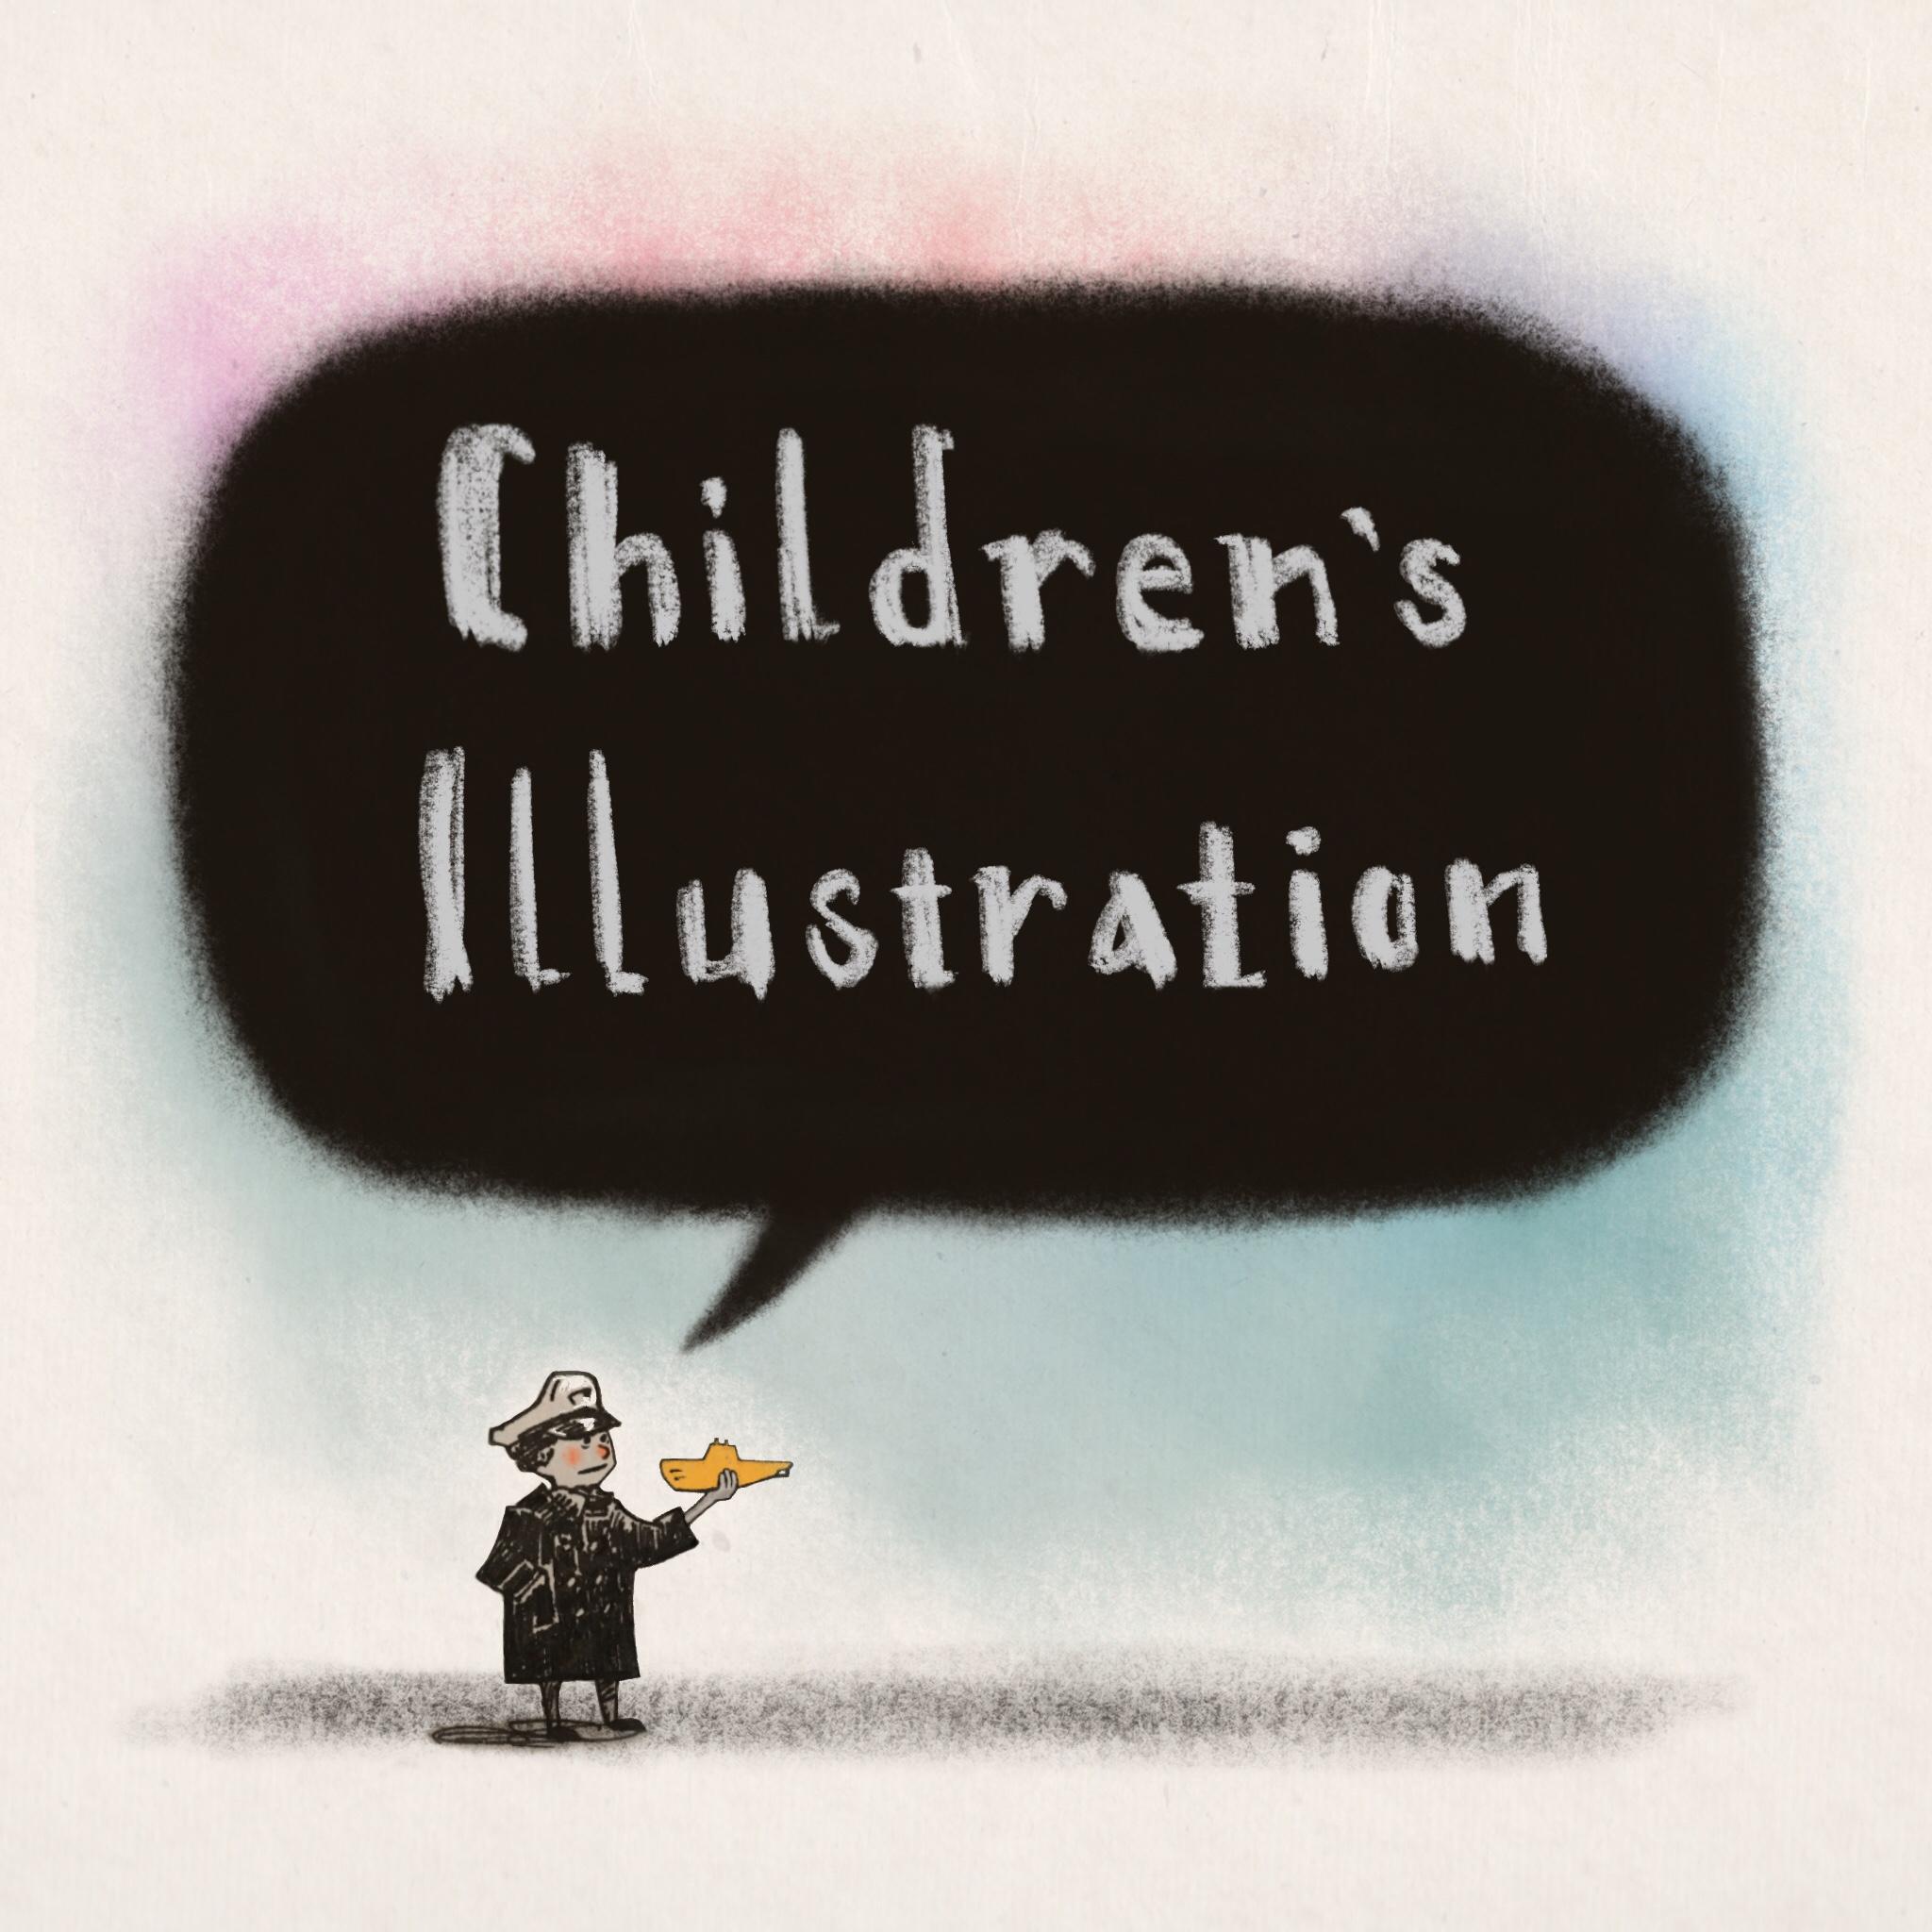 Children's illustration: book, product, etc.